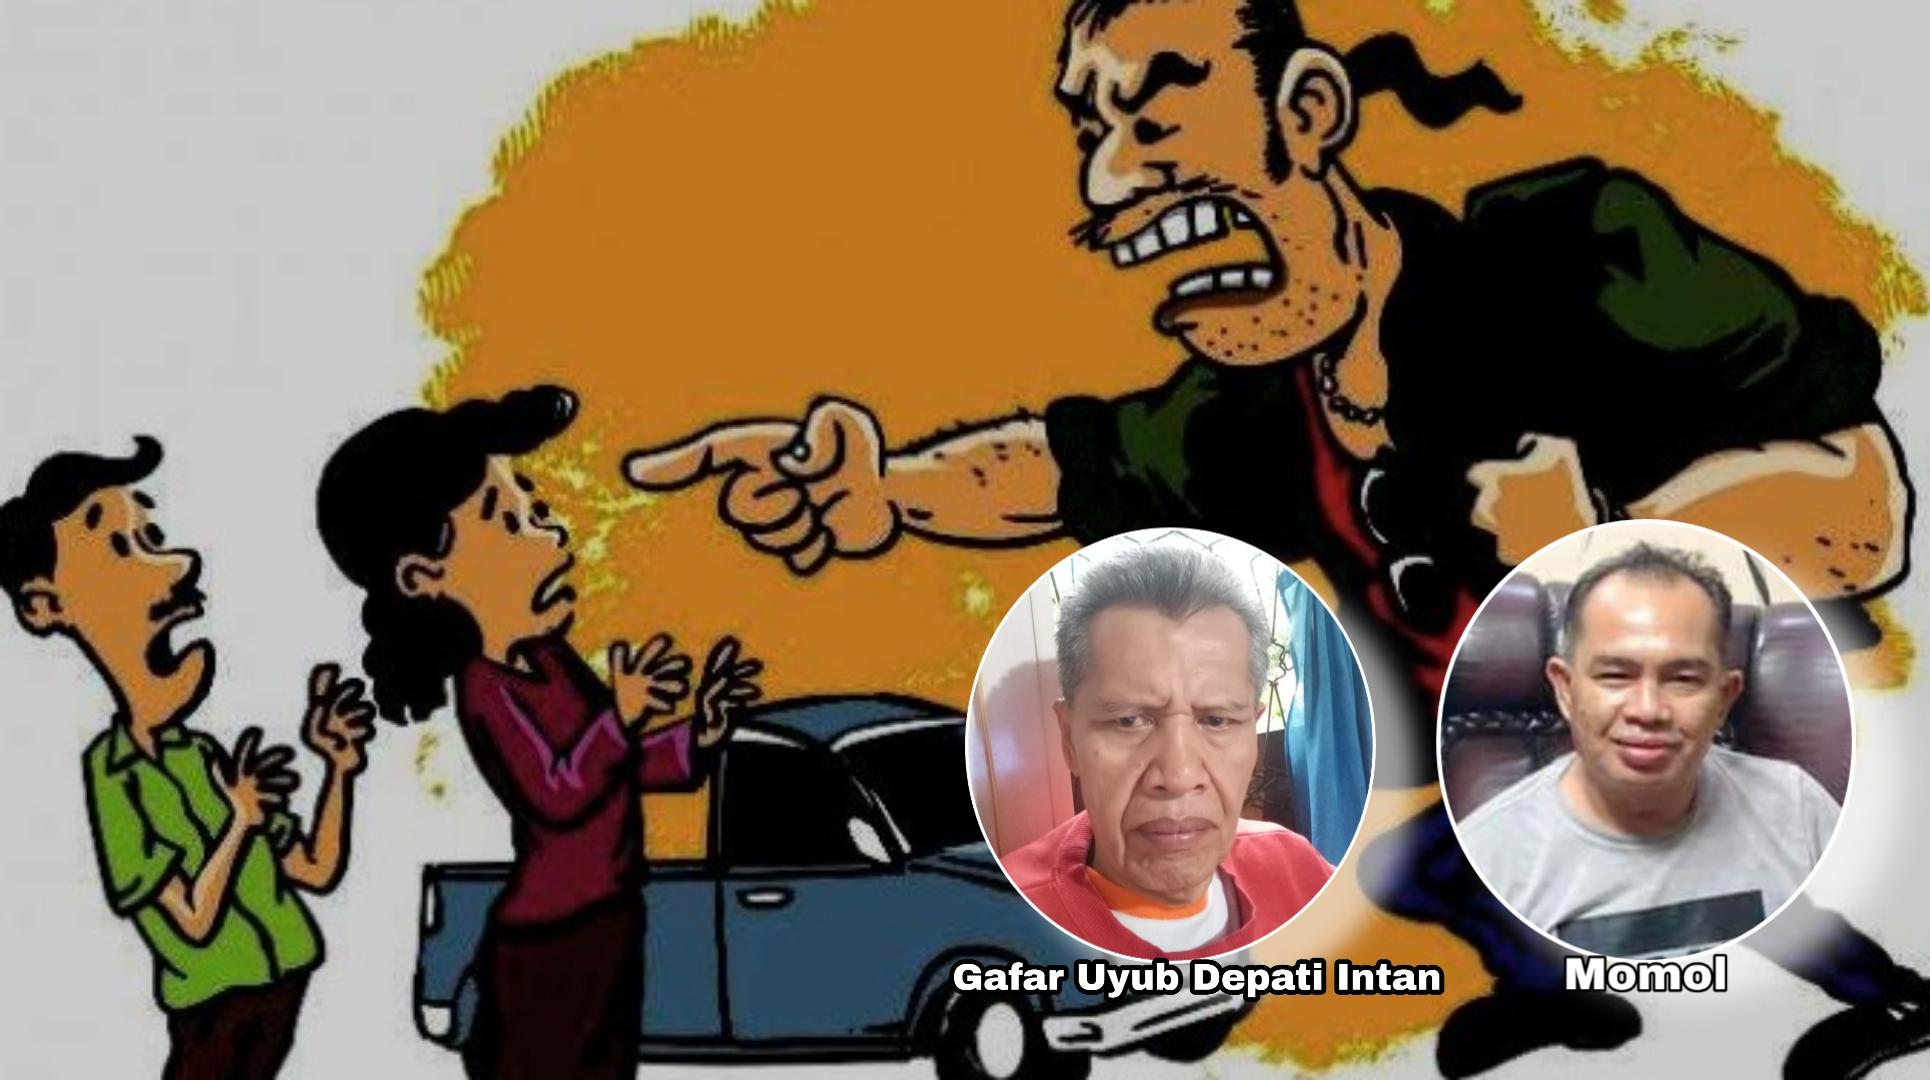 30 September Malam yang Mencemaskan, Wartawan BEO.co.id Edwar Mulfen